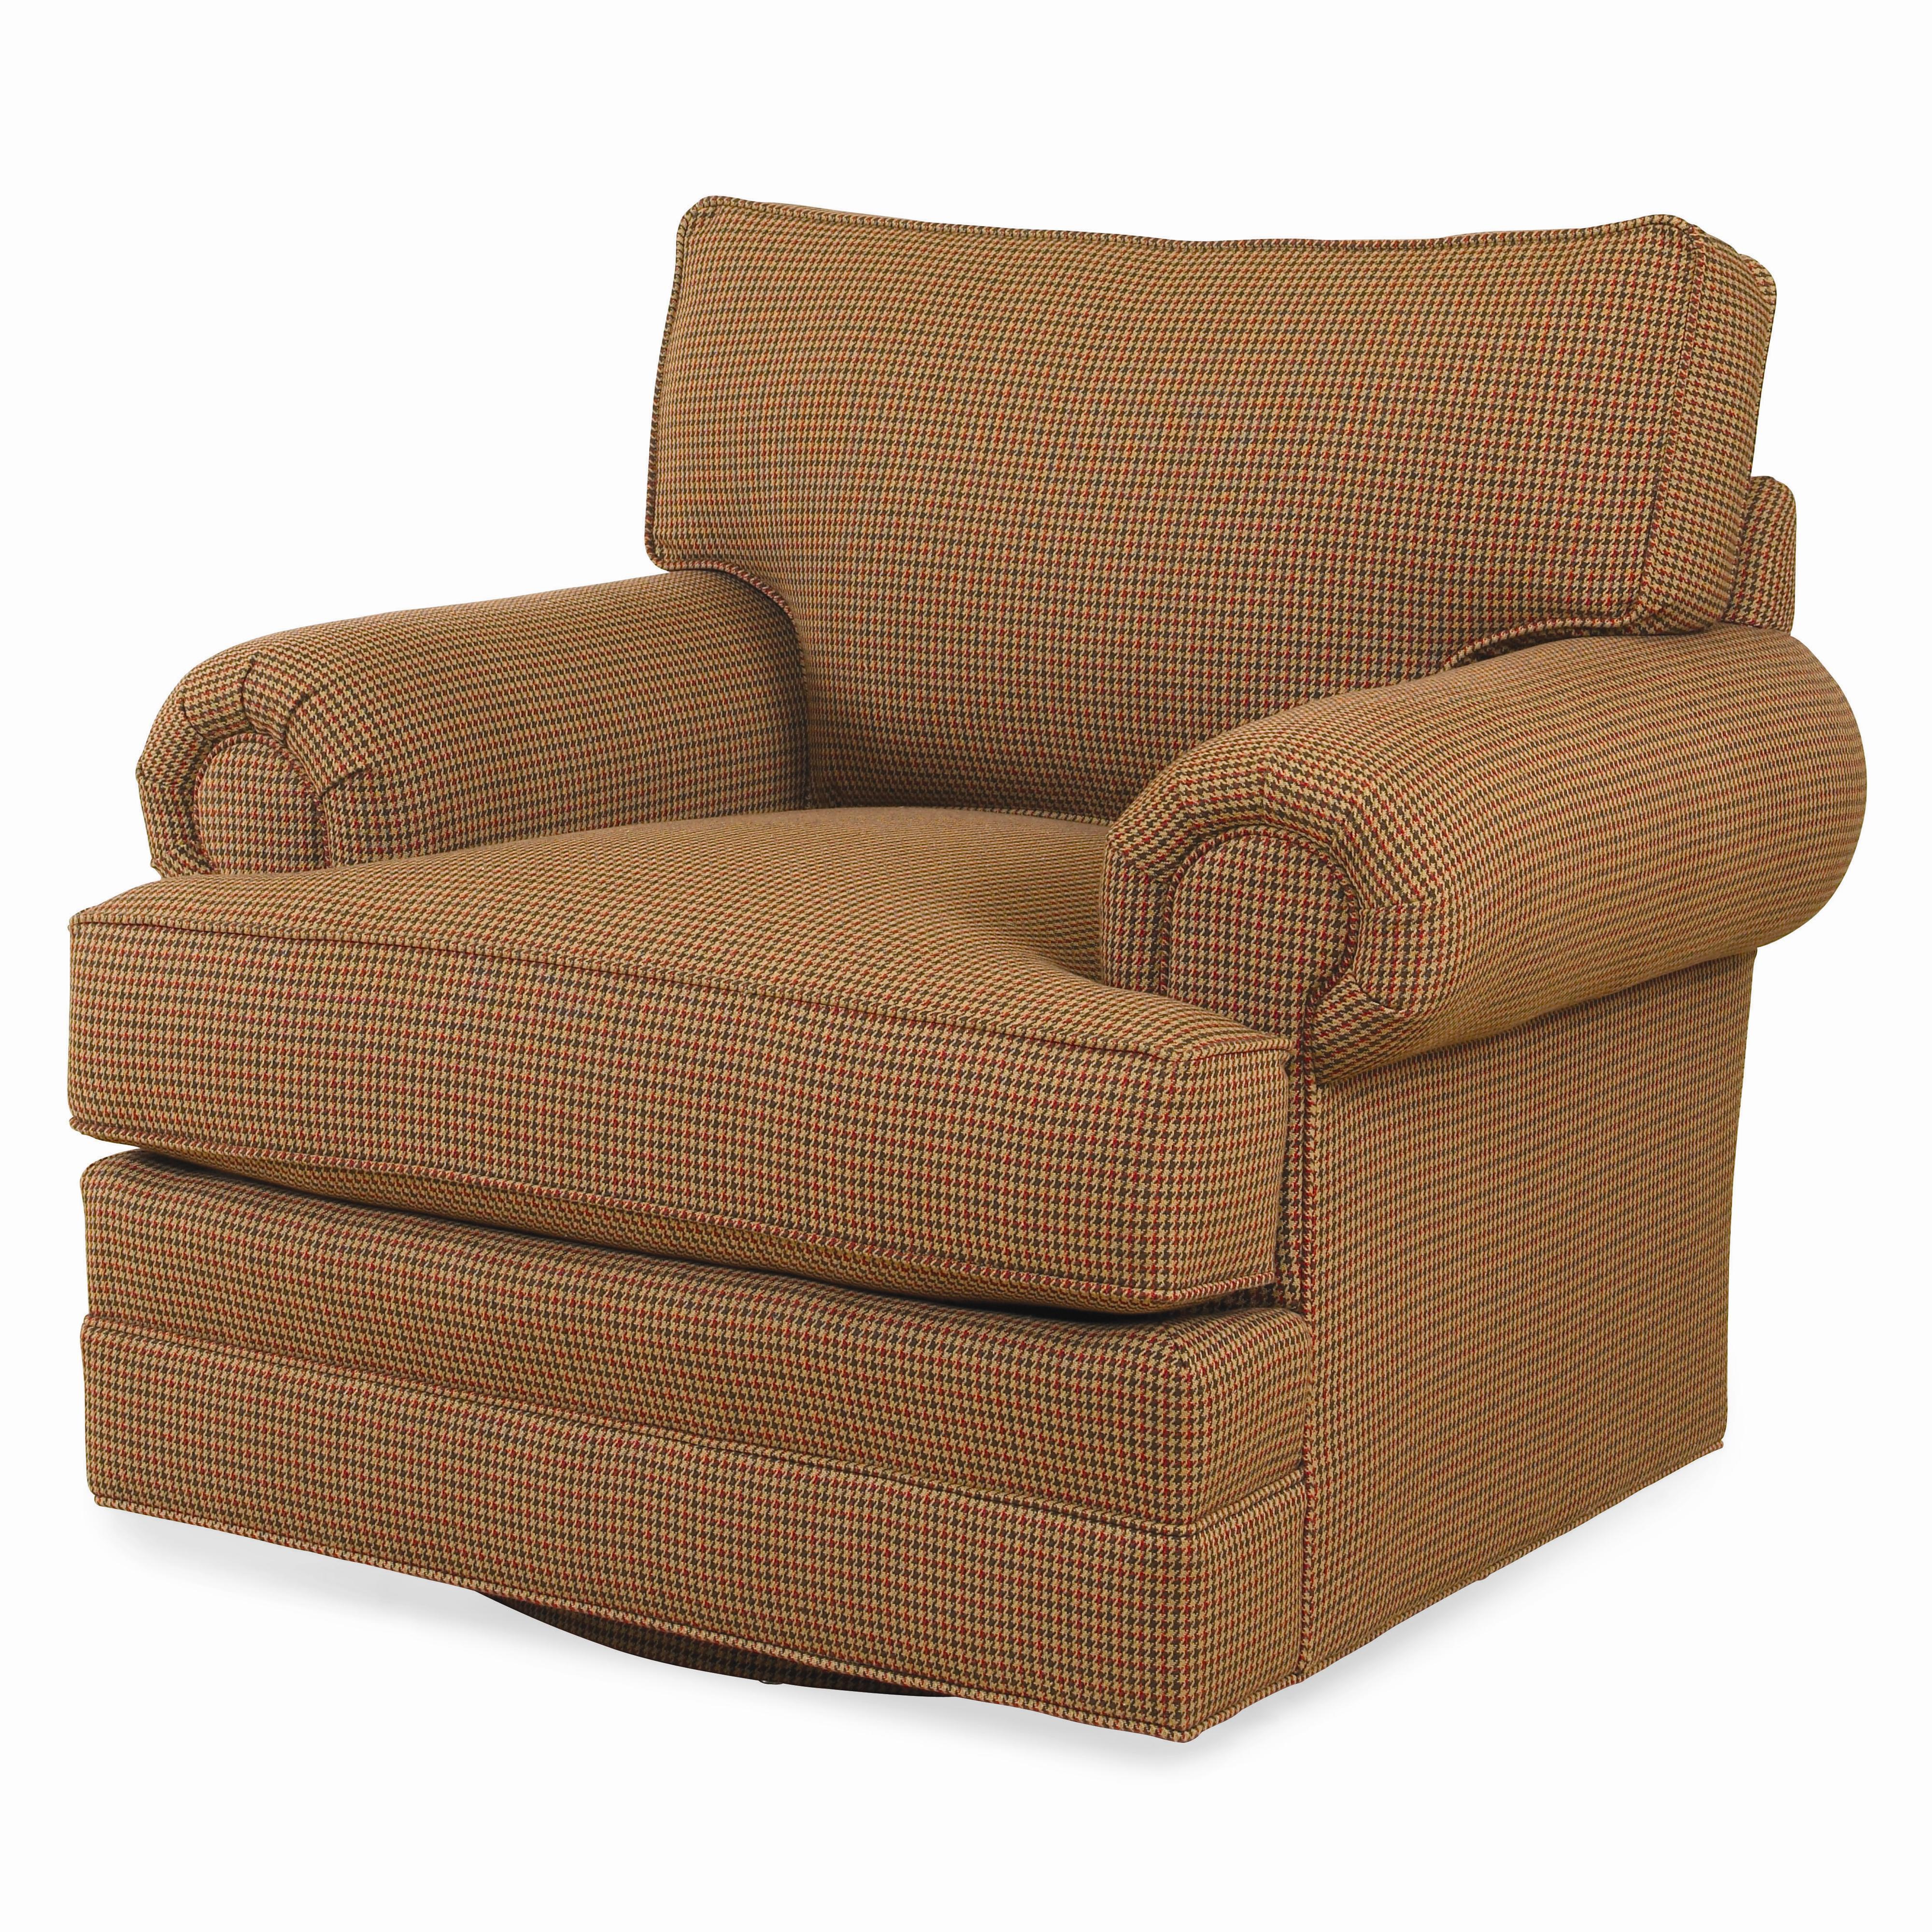 Cornerstone  <b>Customizable</b> Swivel Chair by Century at Baer's Furniture